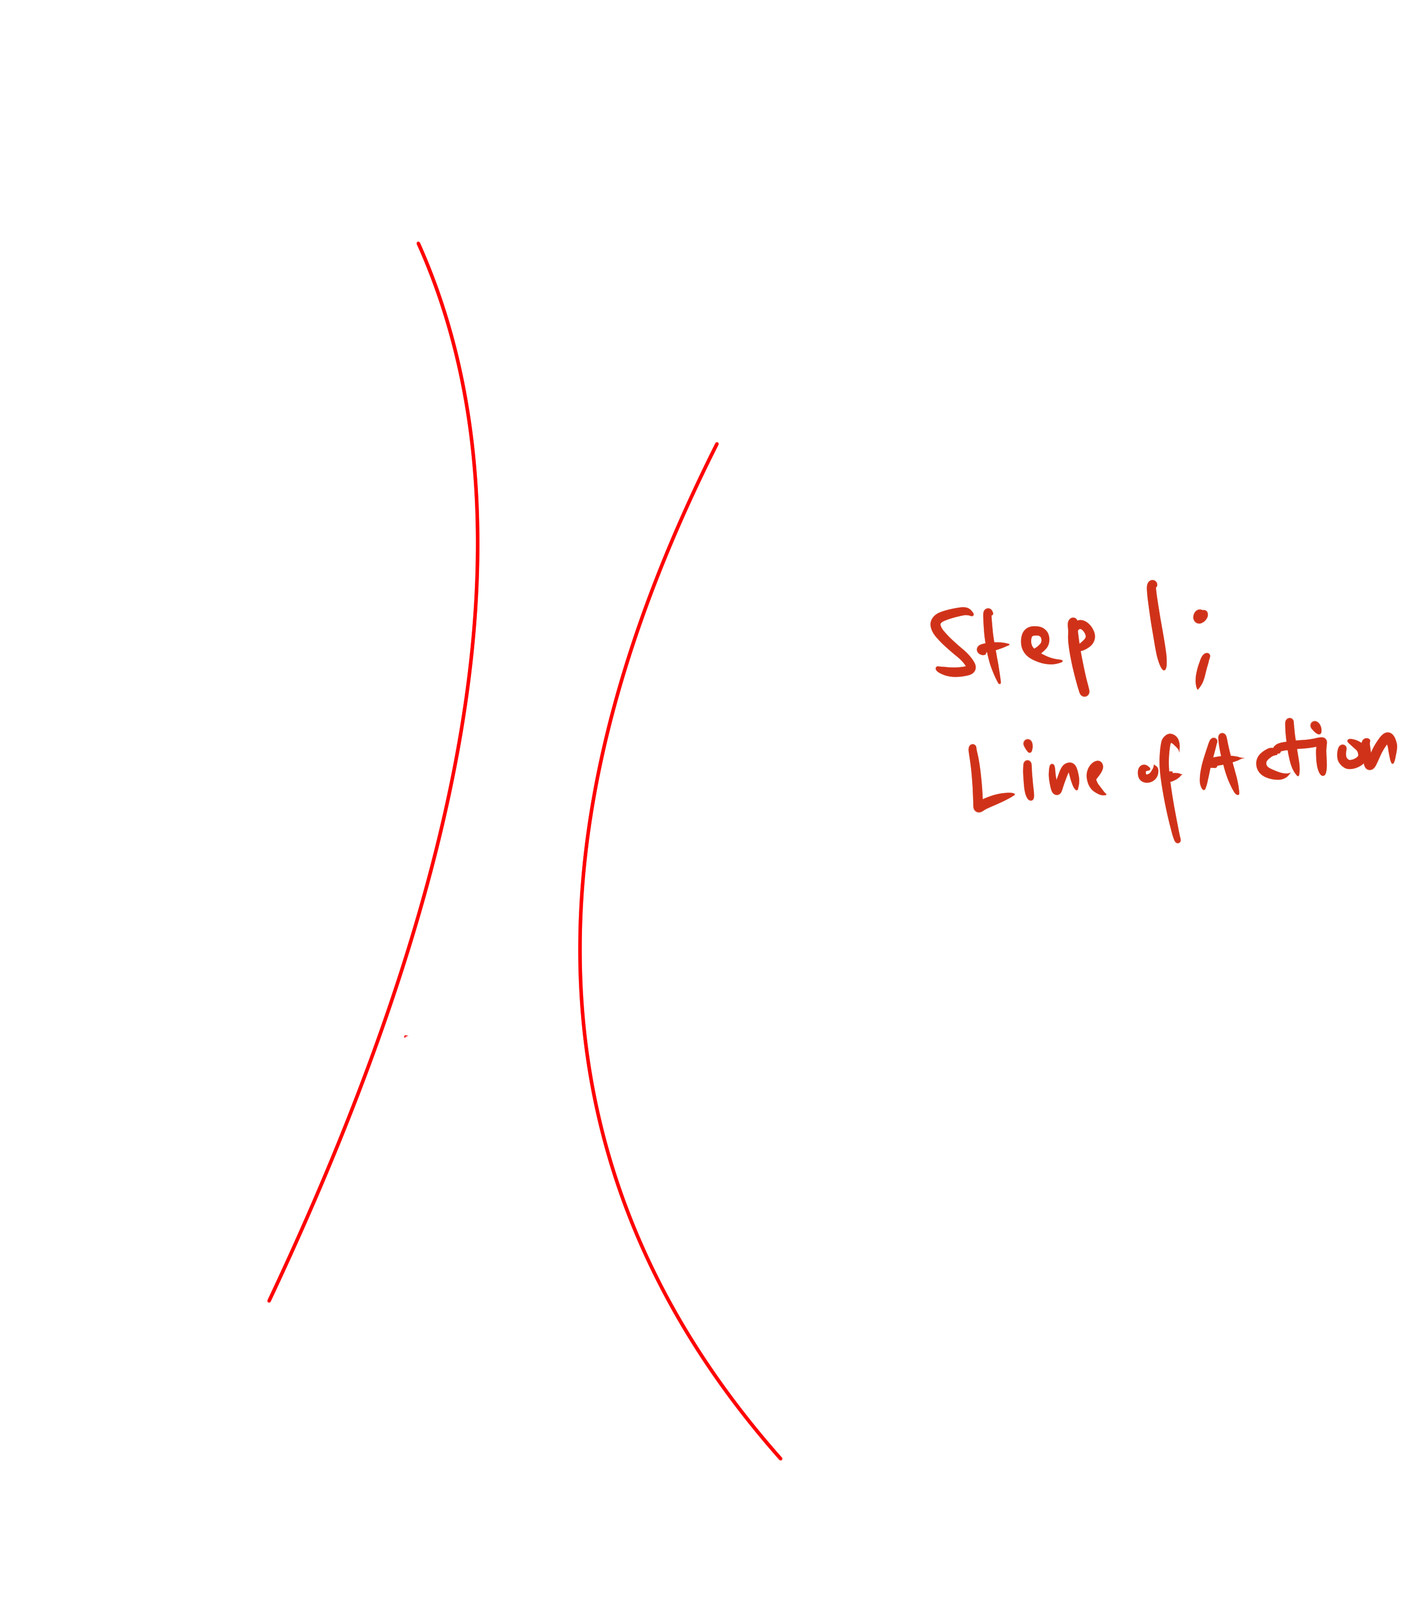 Step 1 of 7